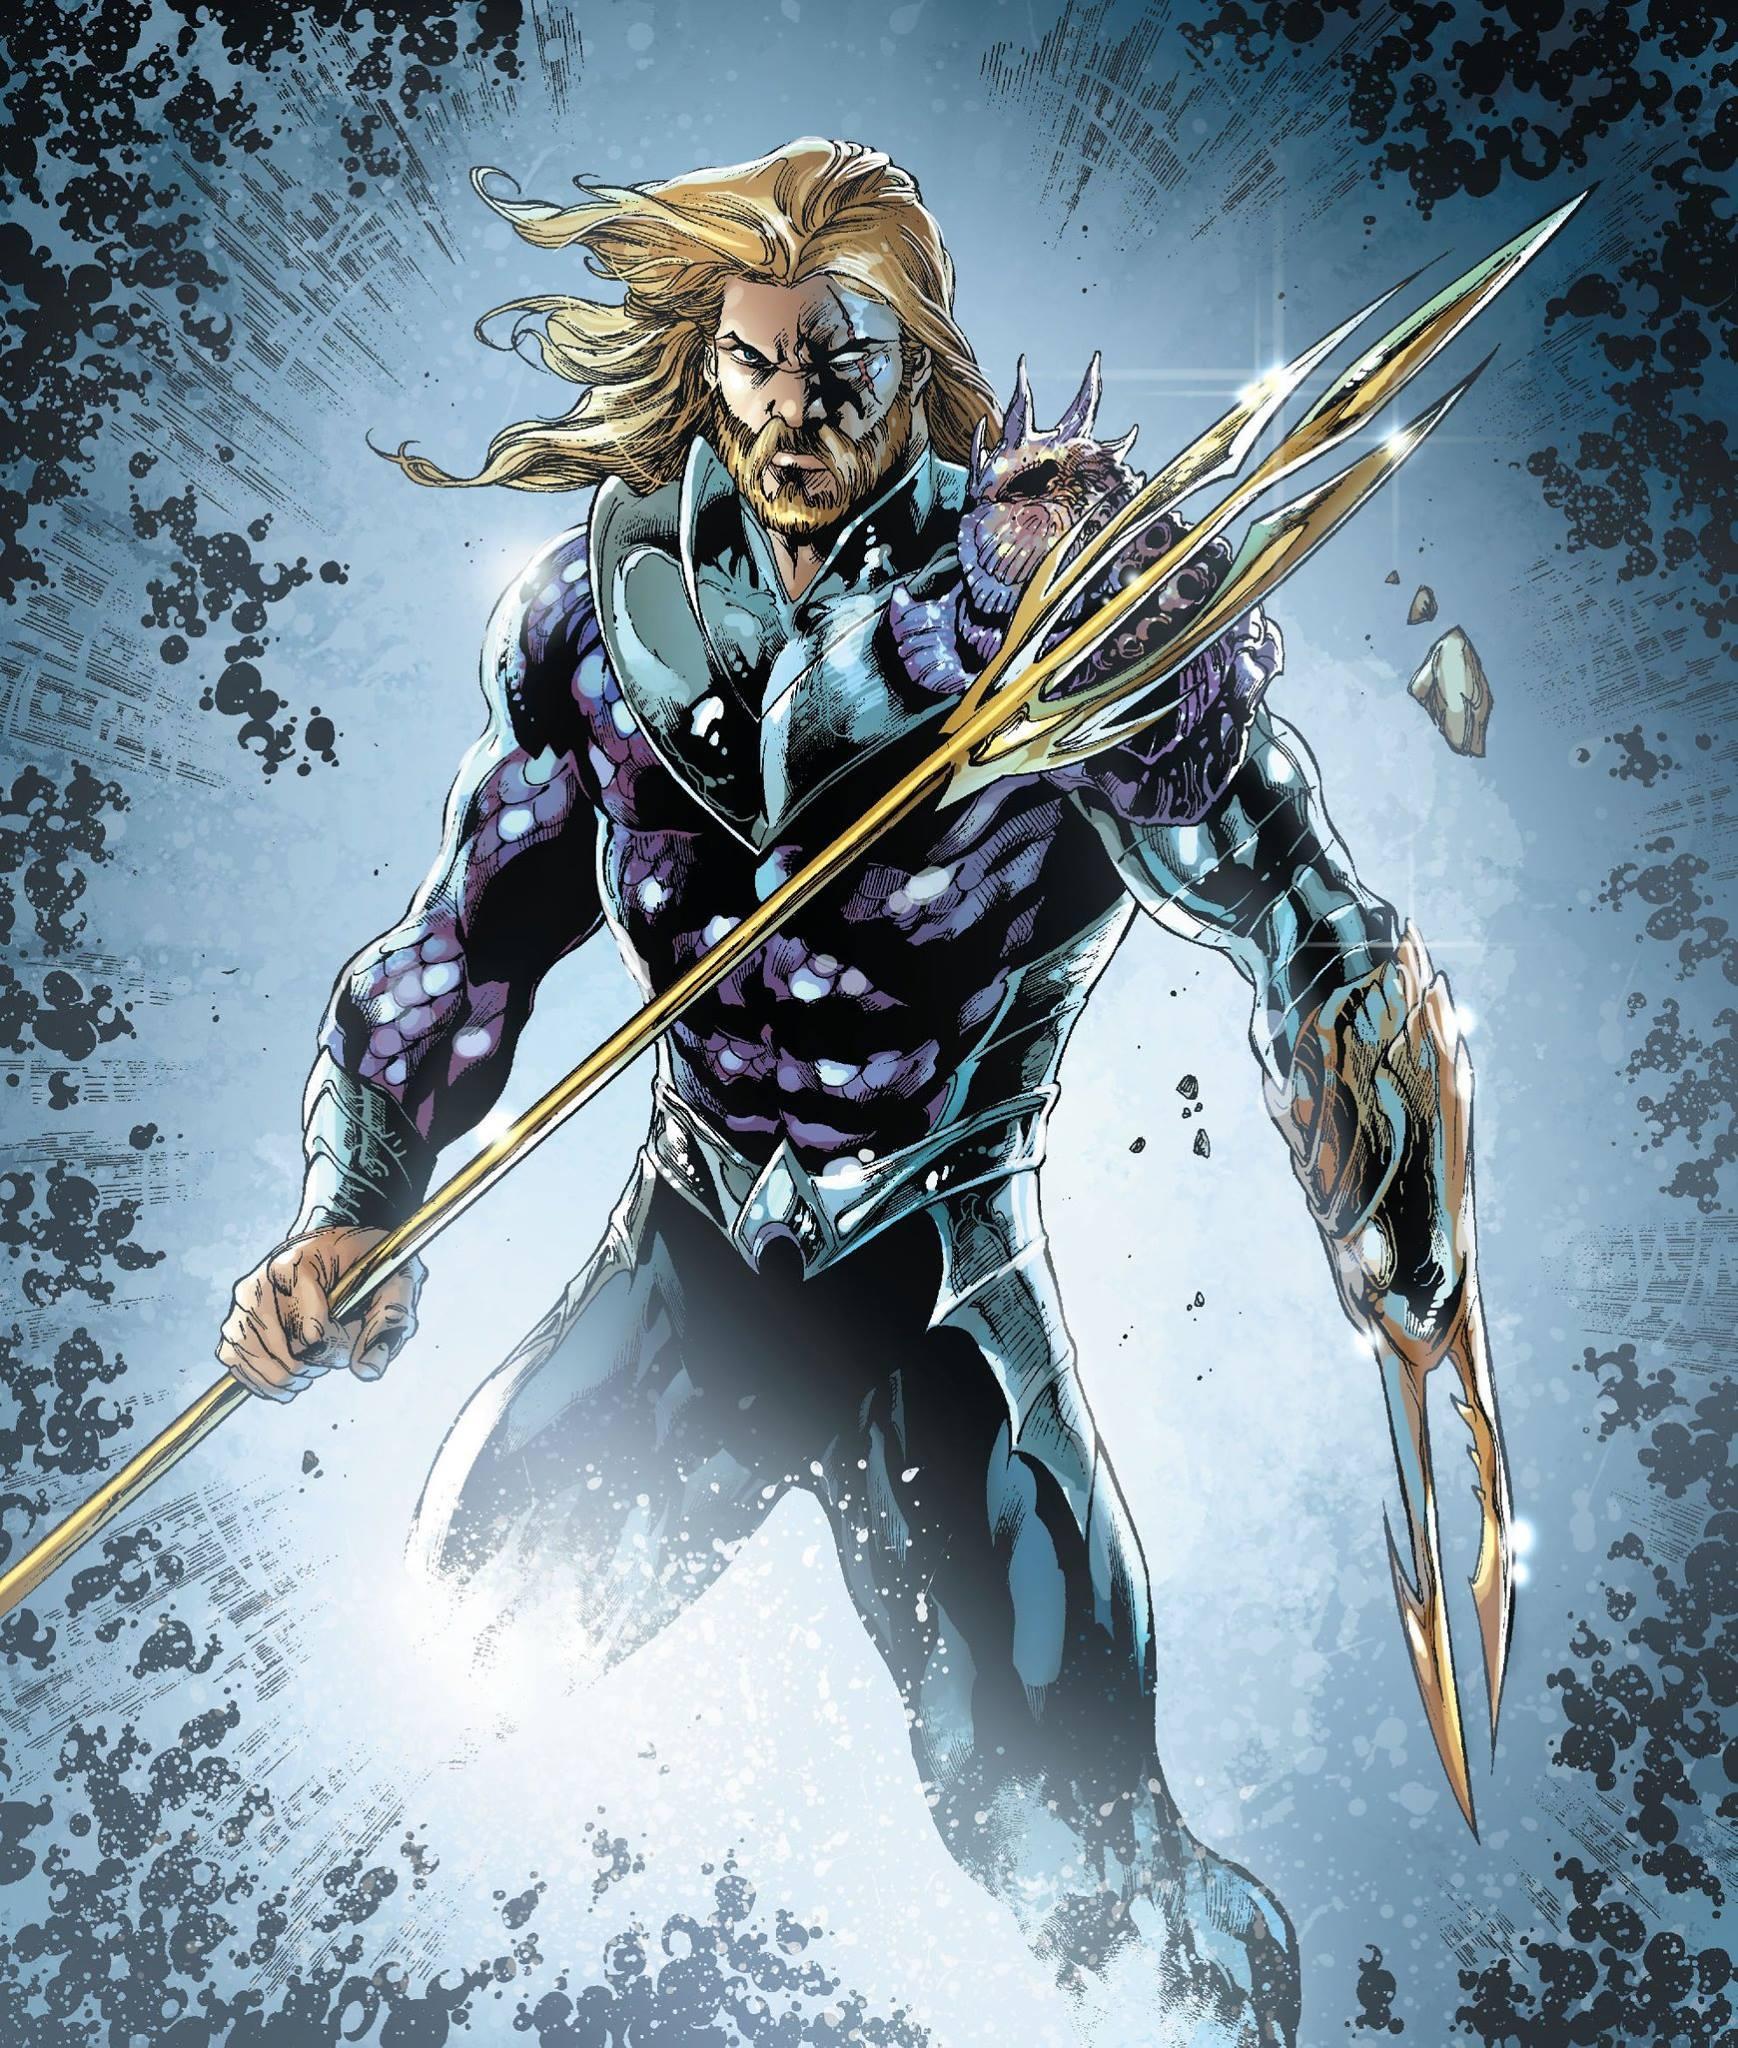 Jason Momoa Zack Snyder Changed Aquaman Look: First Look At Jason Momoa As Aquaman!